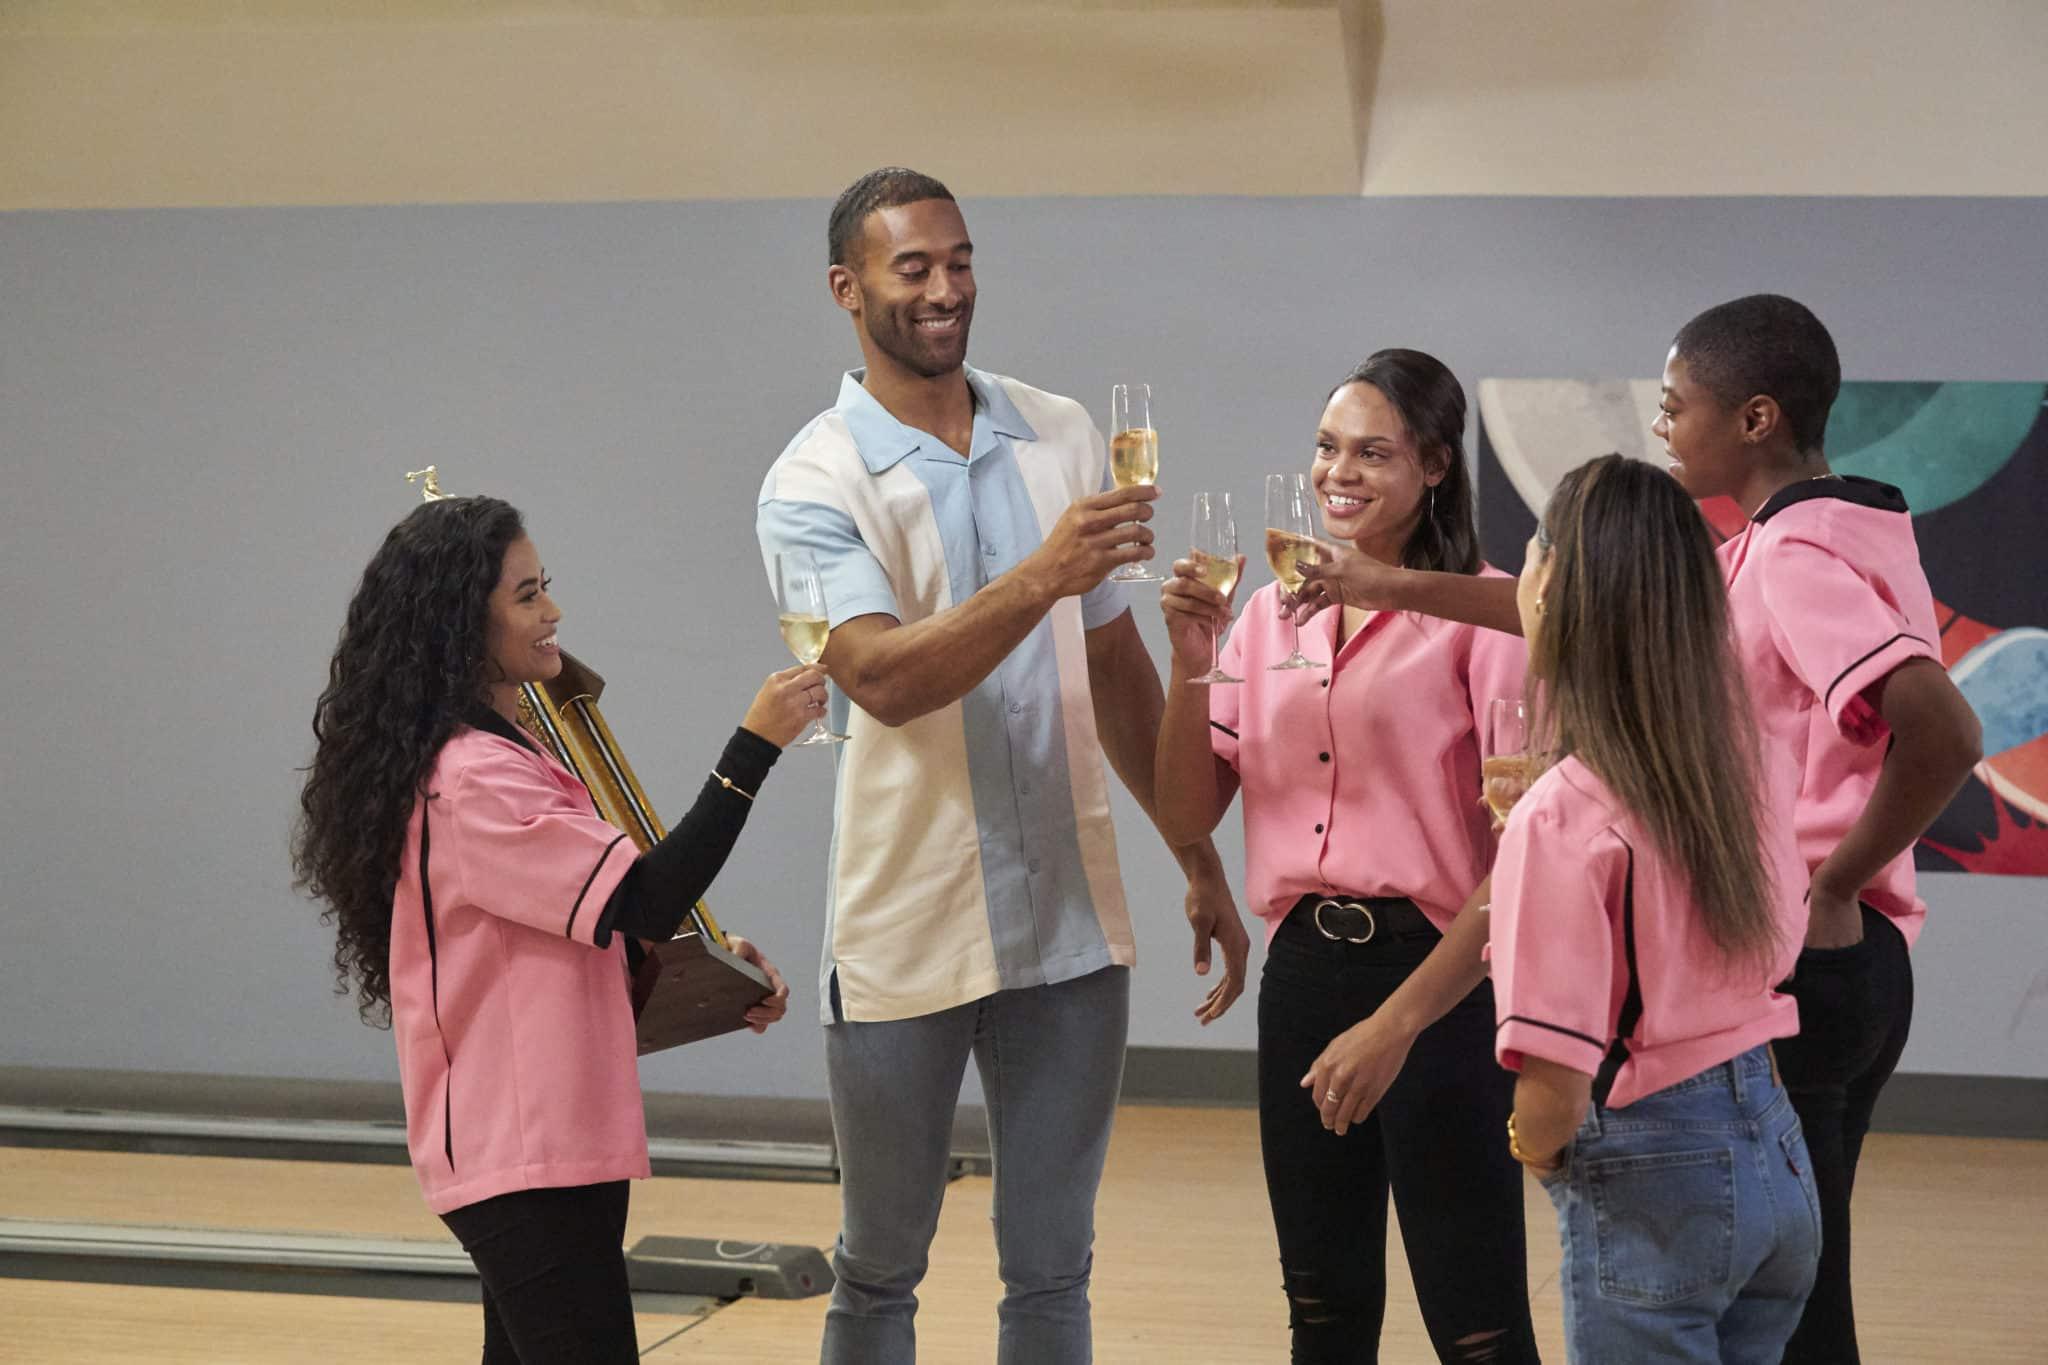 The Bachelor 2021 Week 6 Recap: A Shocking Elimination